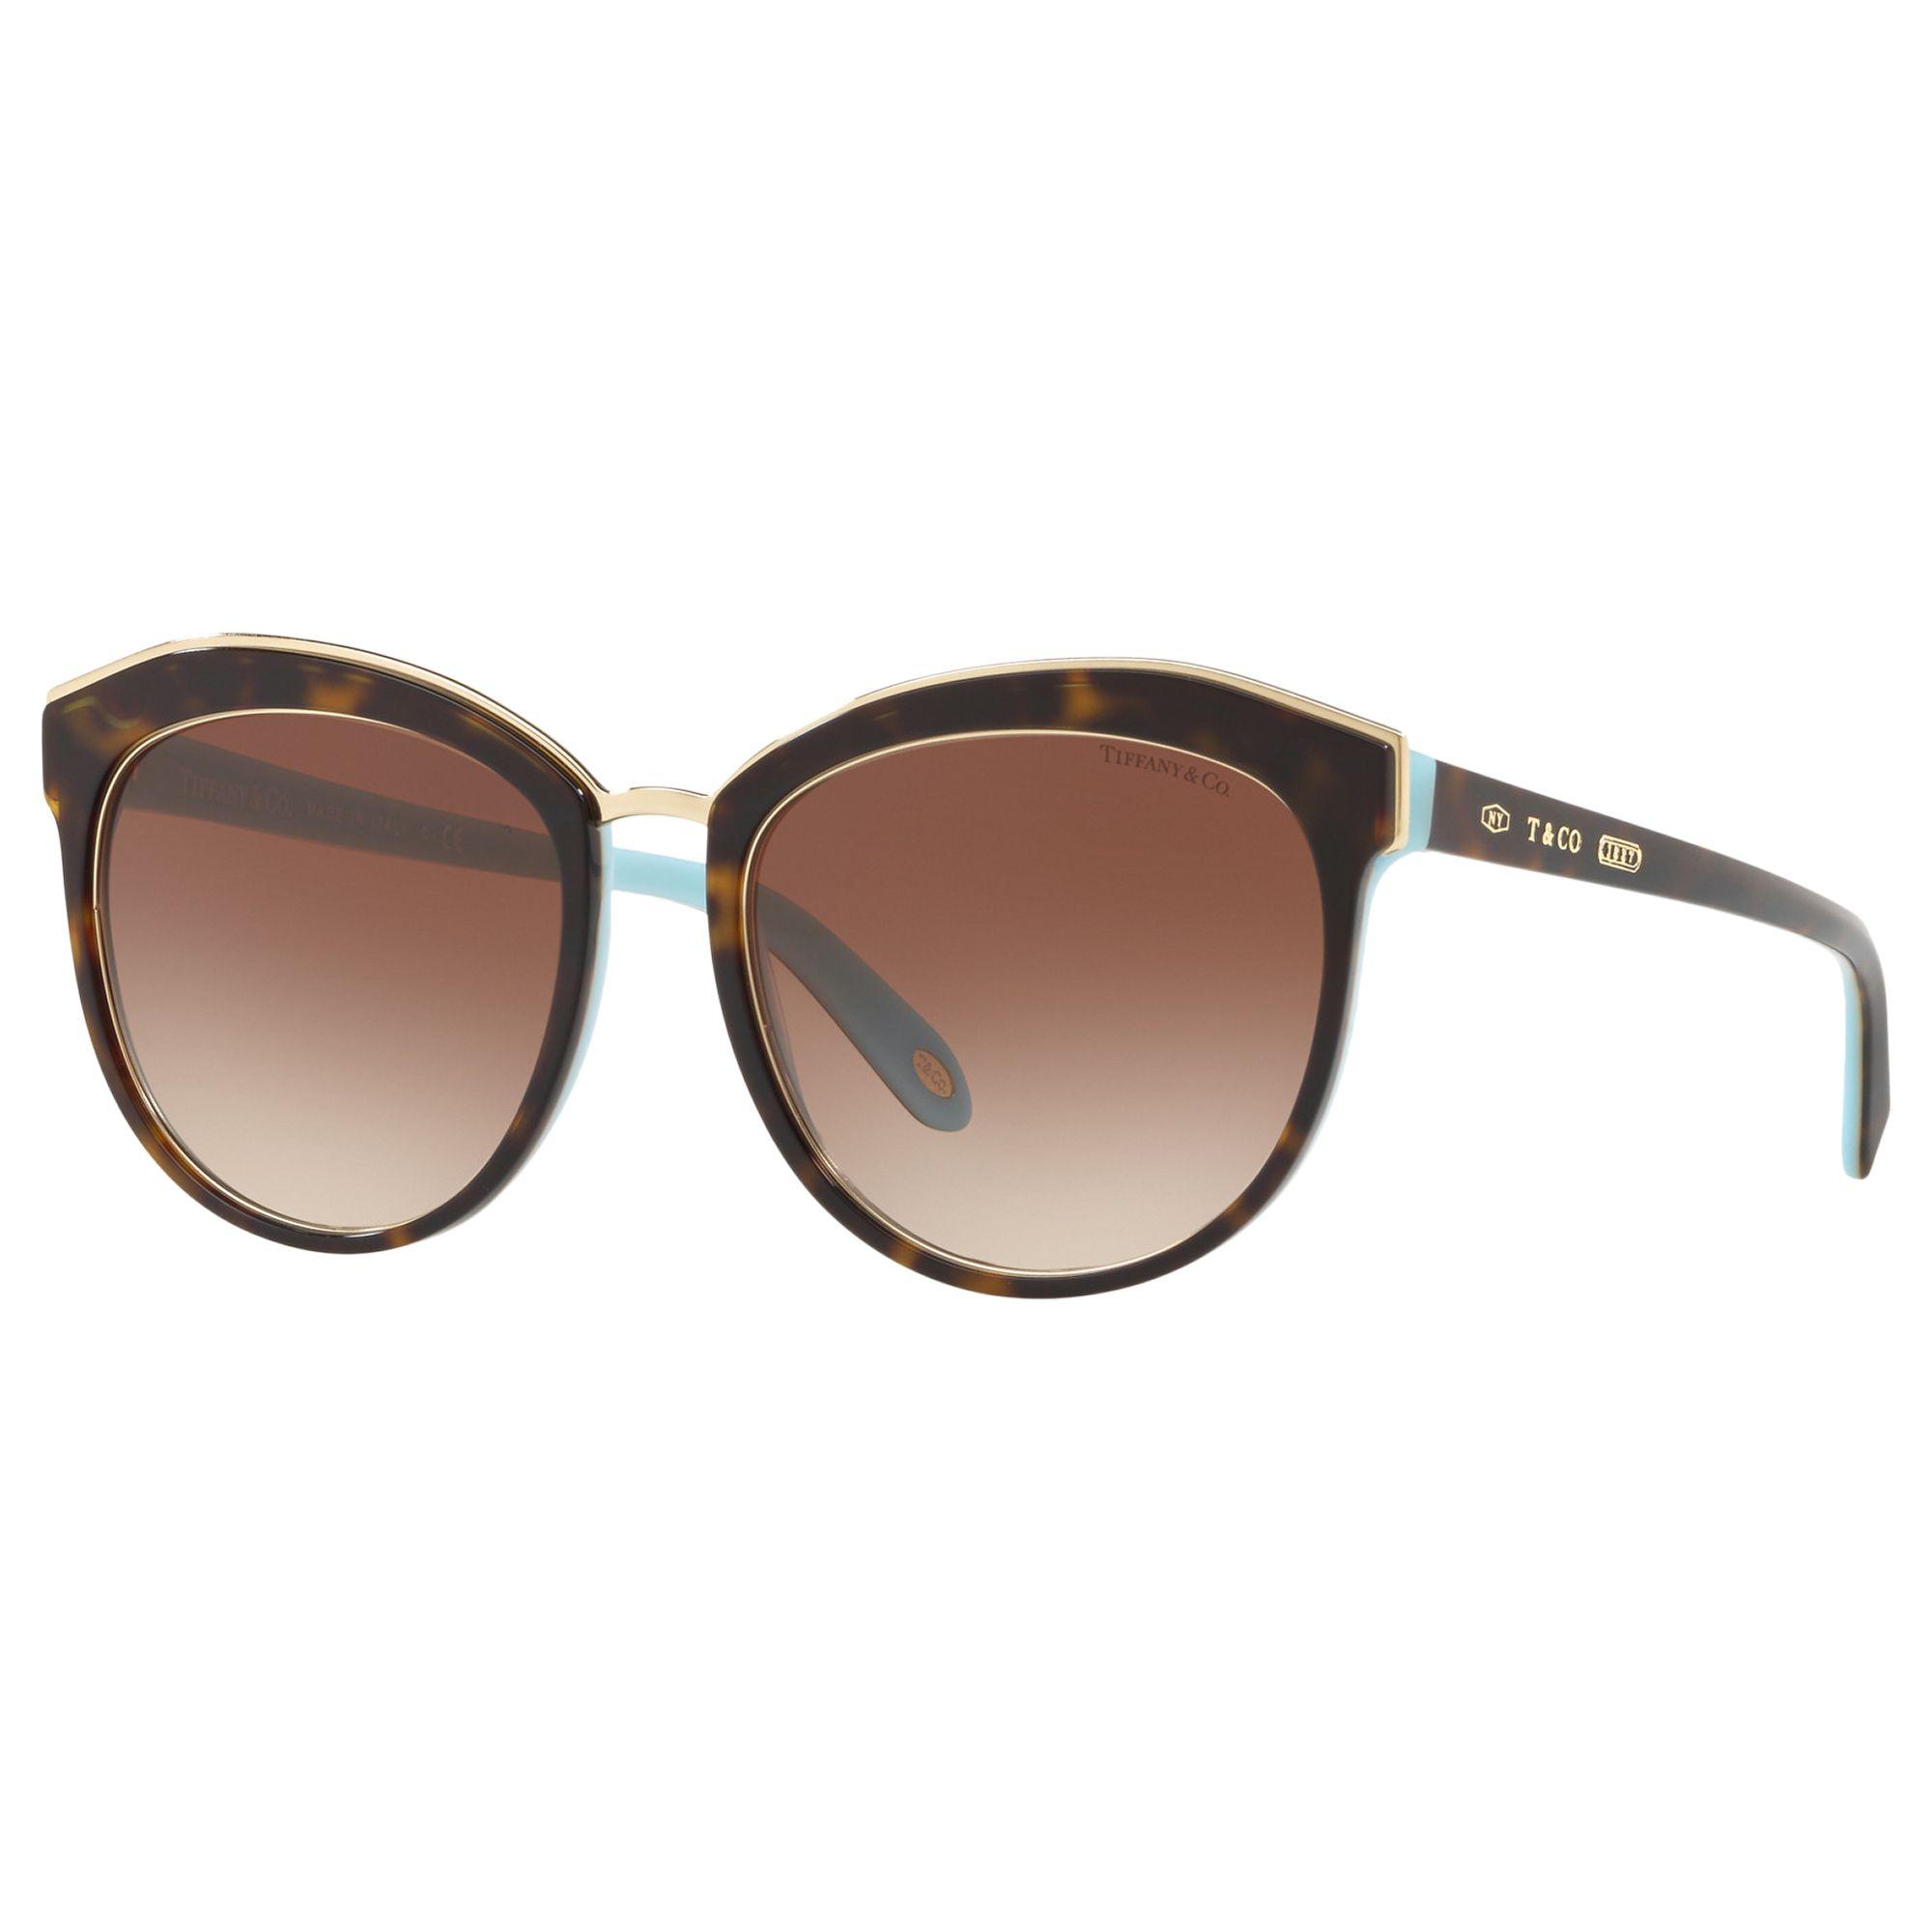 Tiffany & Co Tiffany & Co TF4146 Women's Oval Sunglasses, Tortoise/Brown Gradient